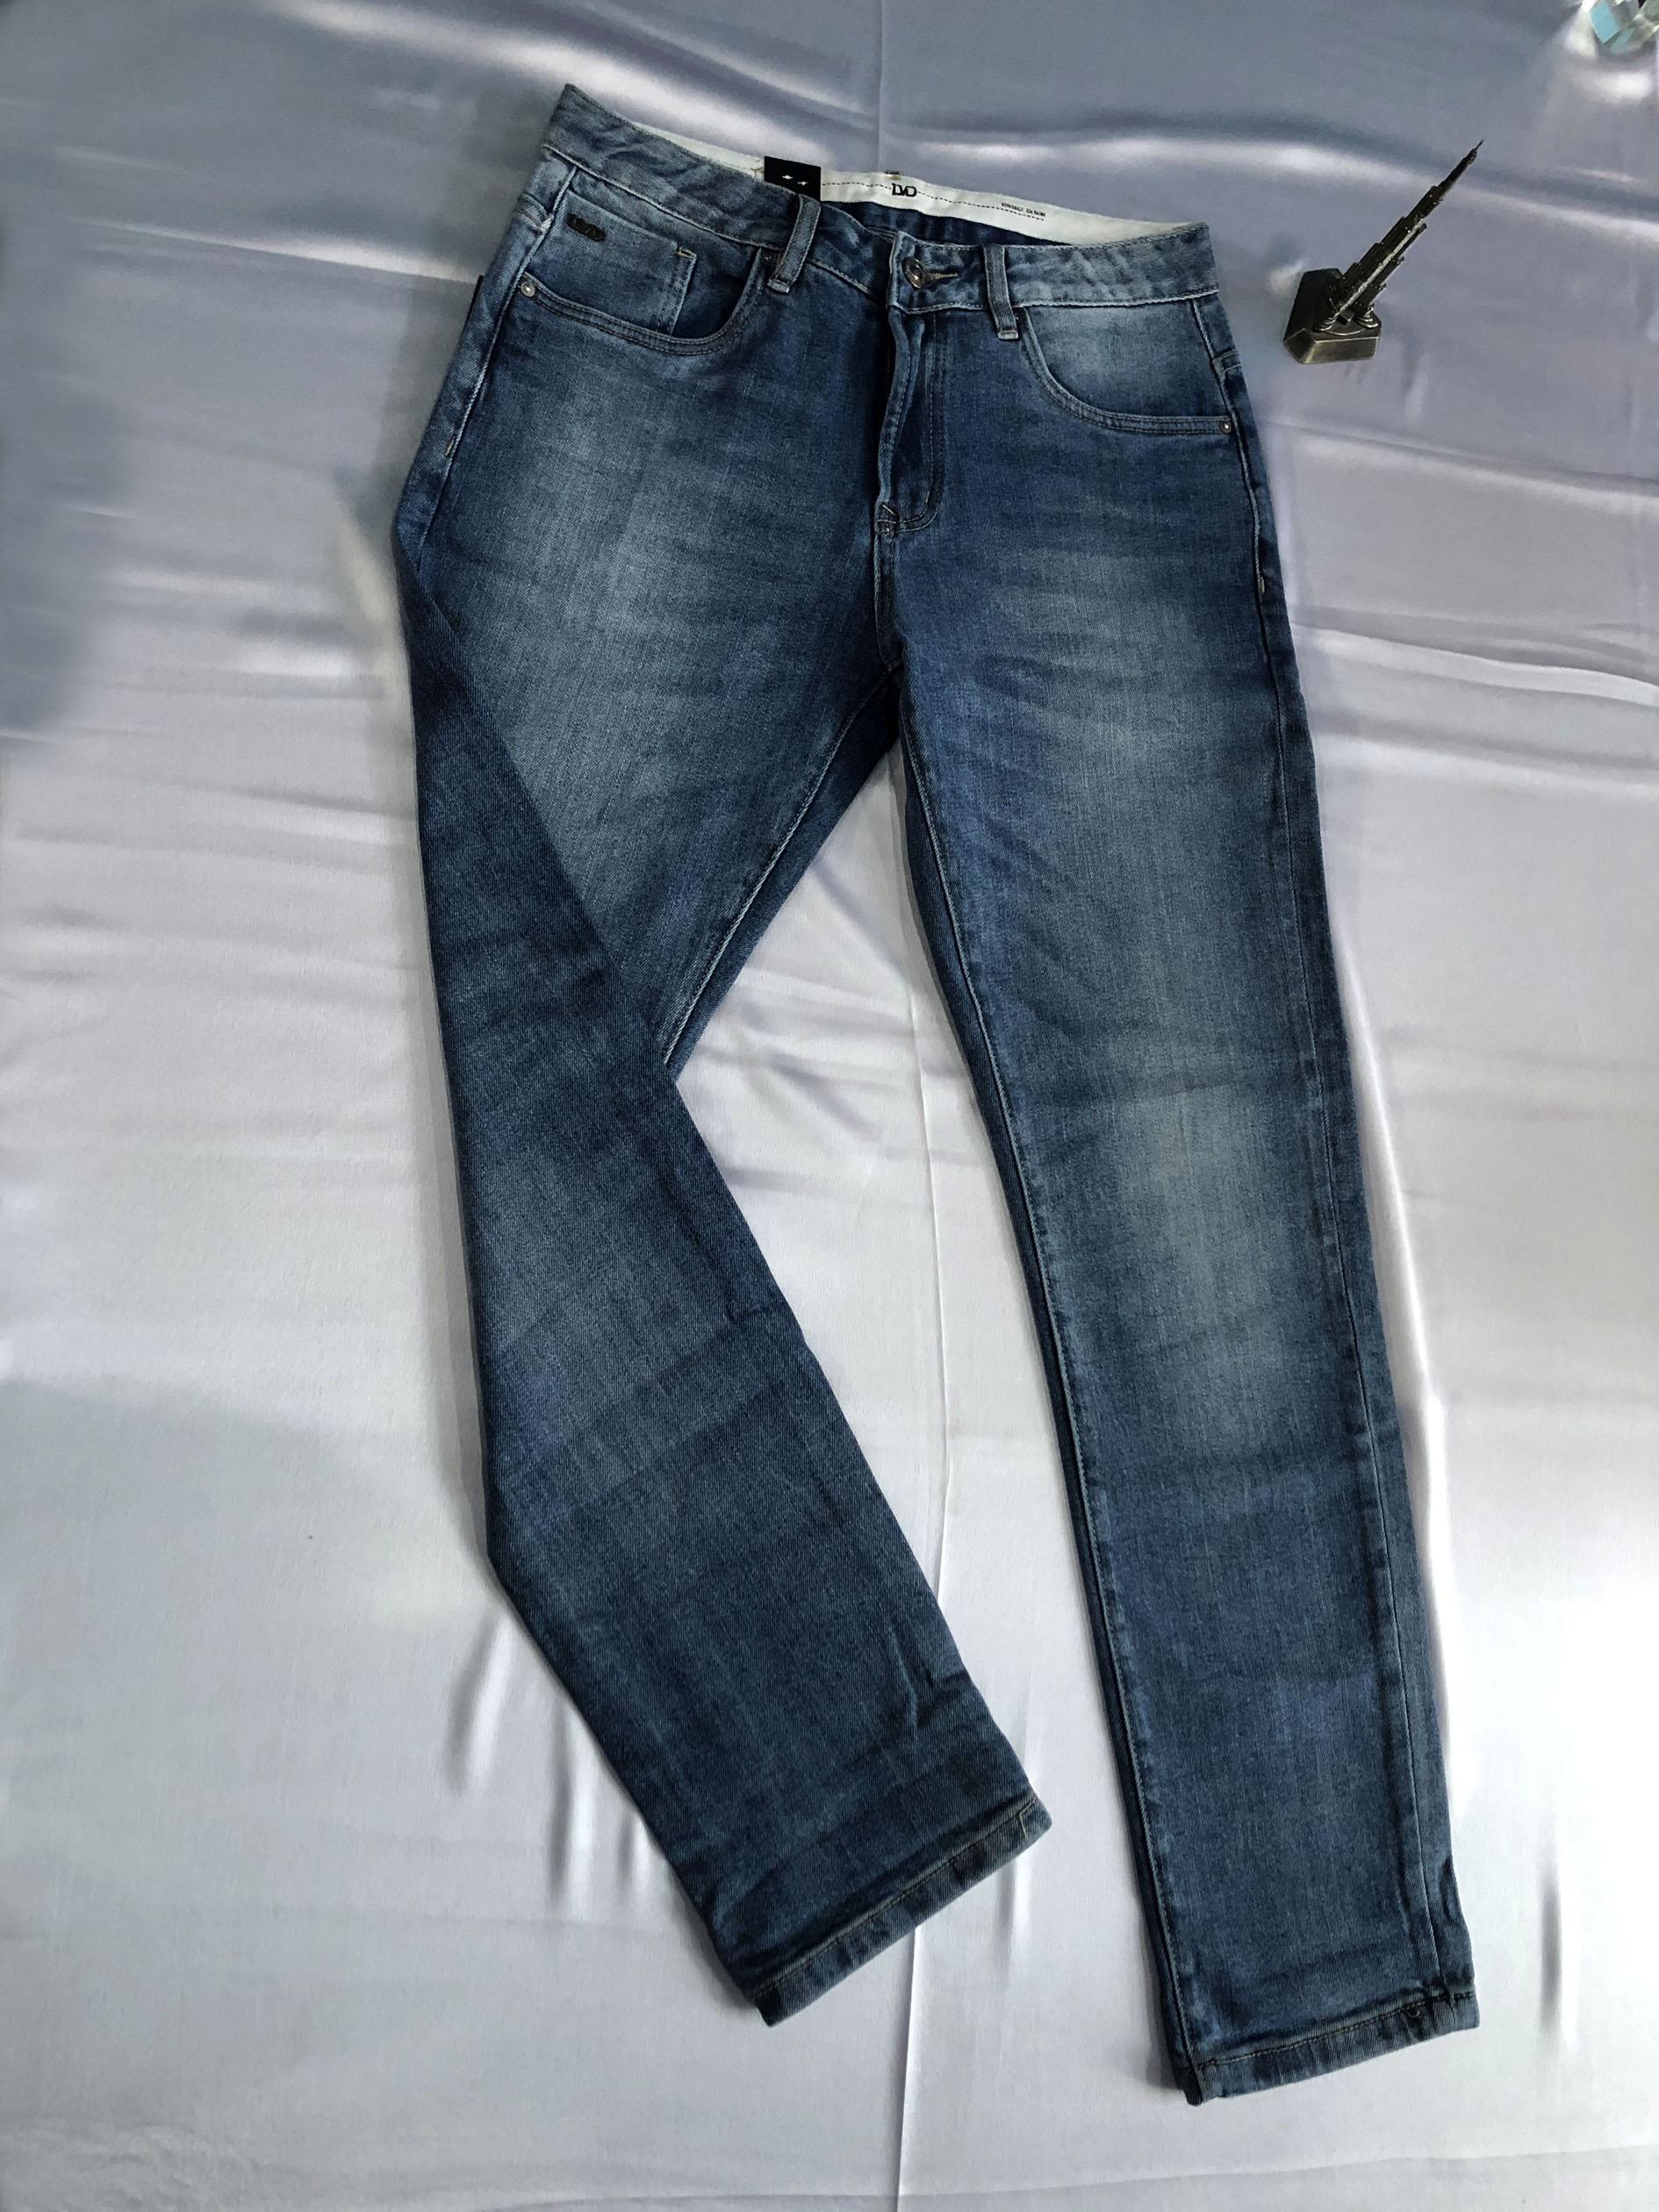 LVD Jeans Slim Straight Light Blue